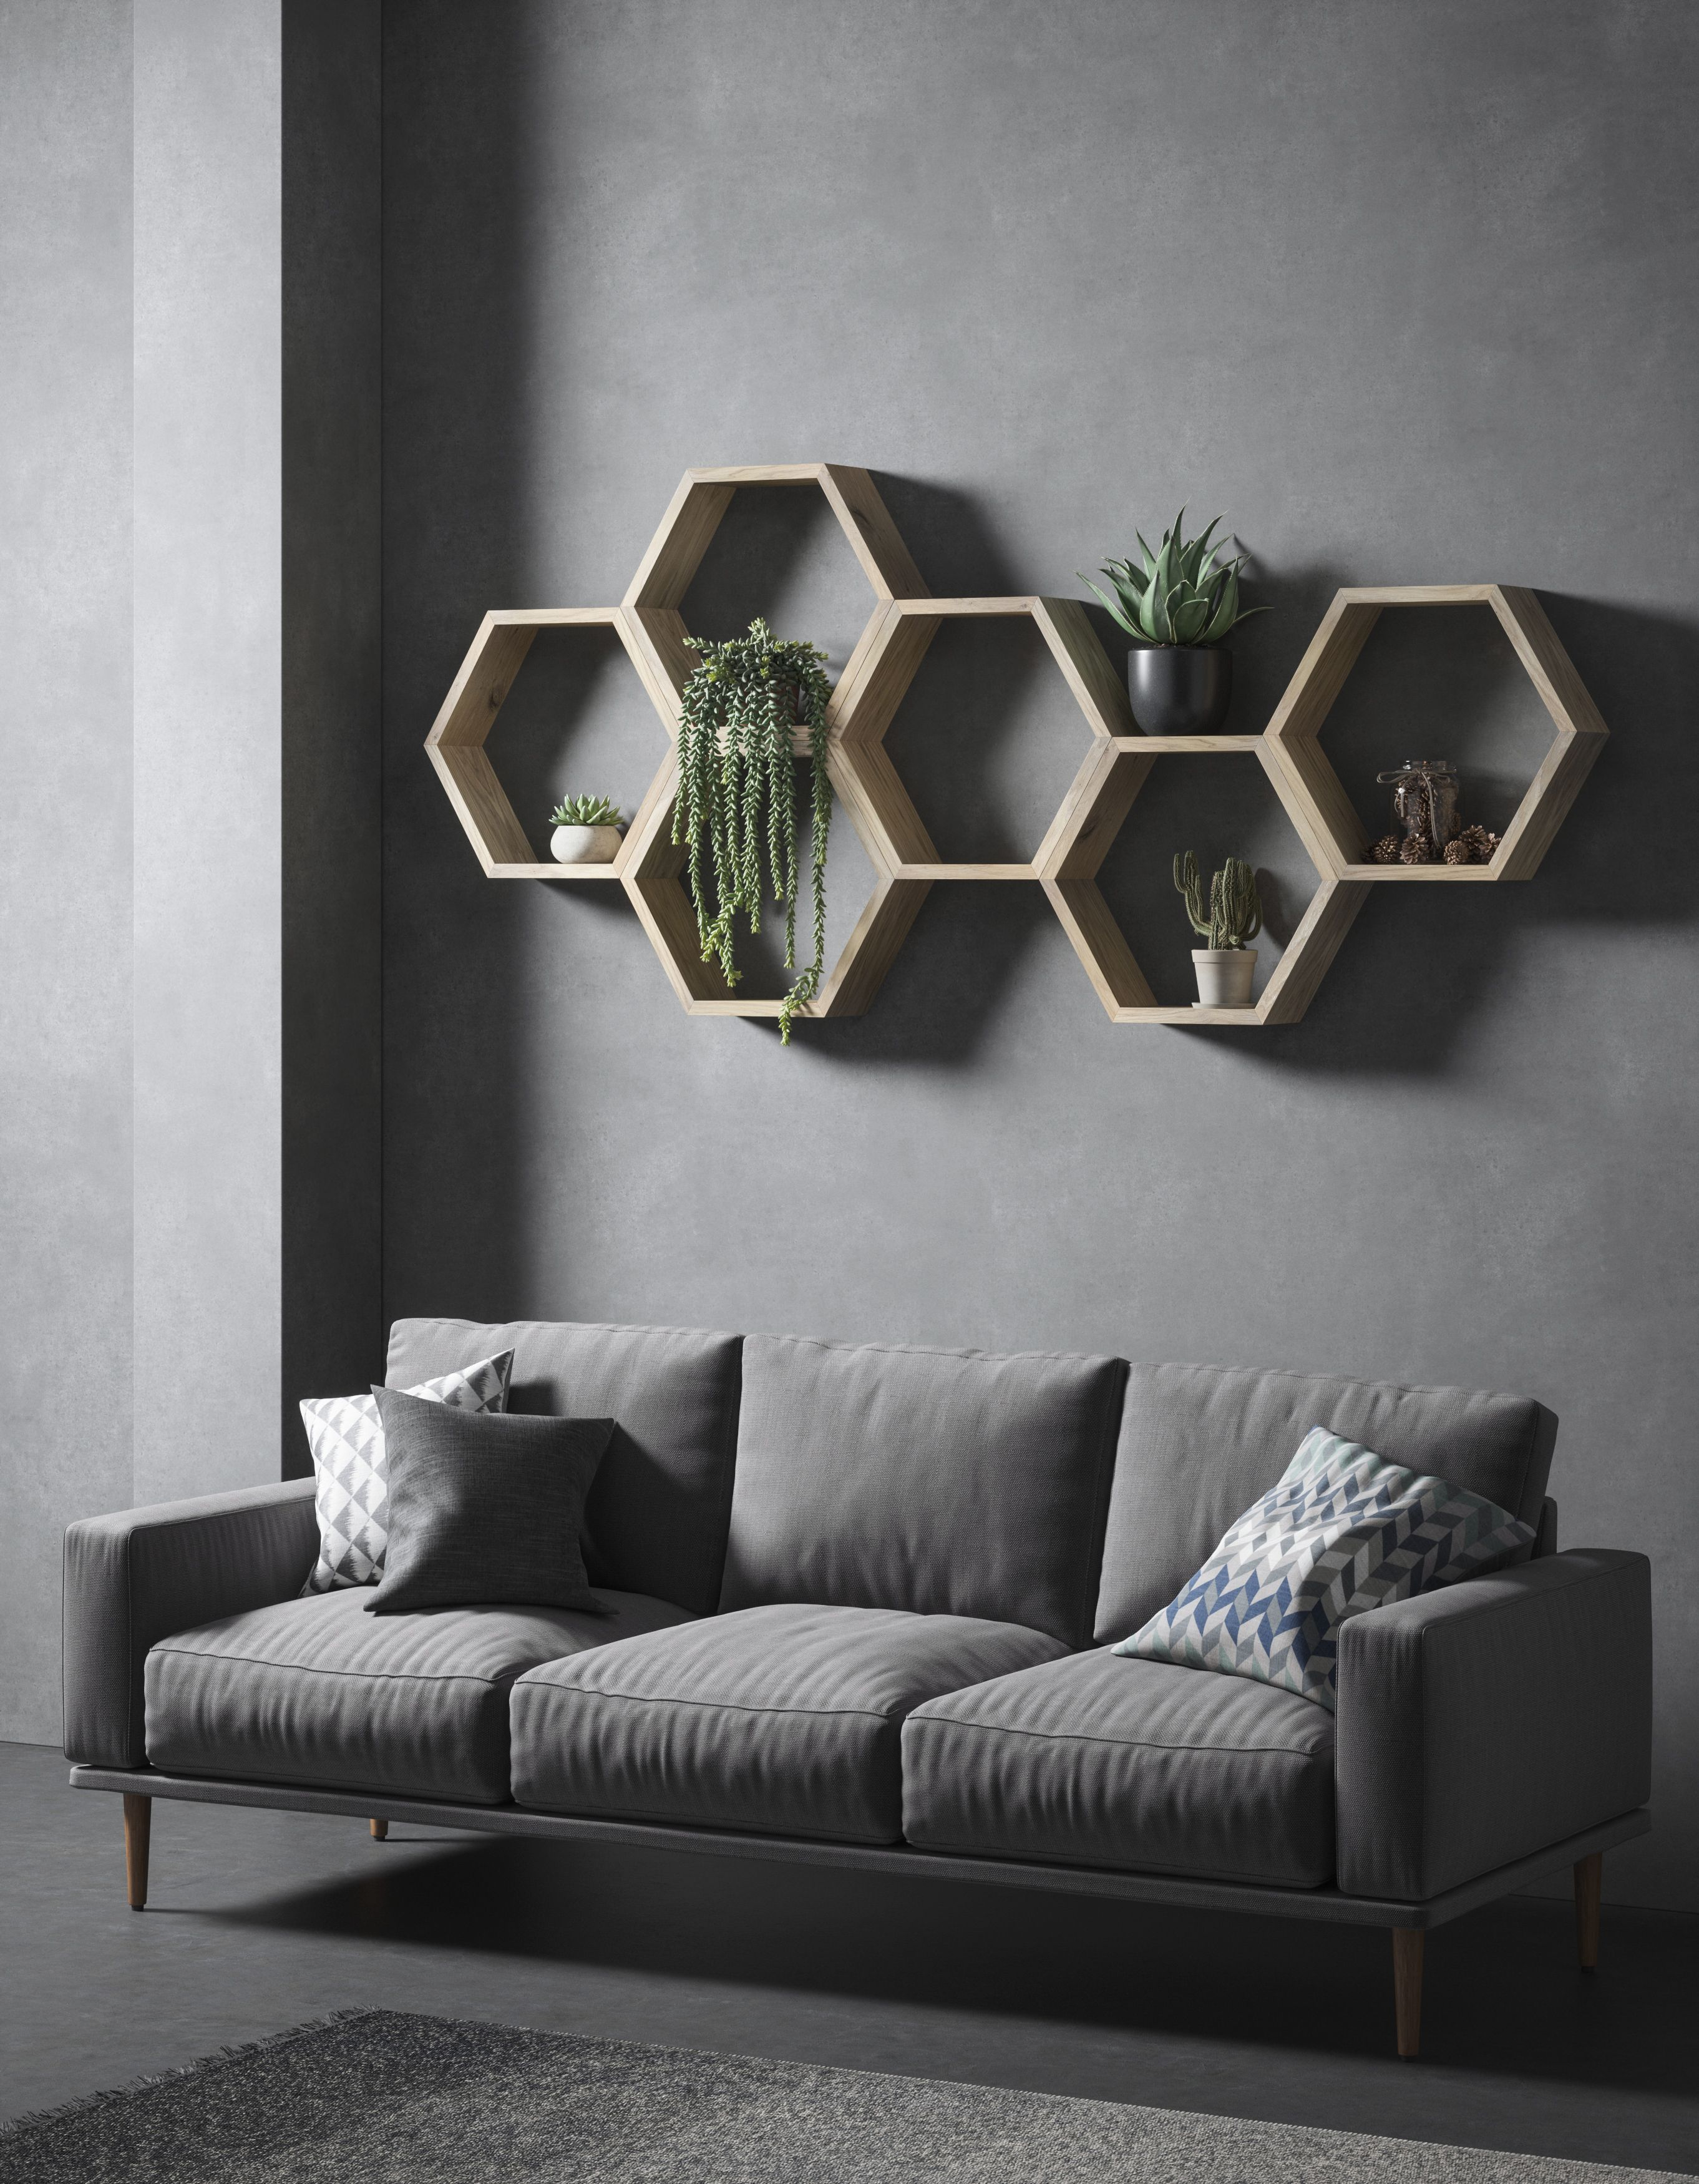 Wall Shelves Shelf Decor